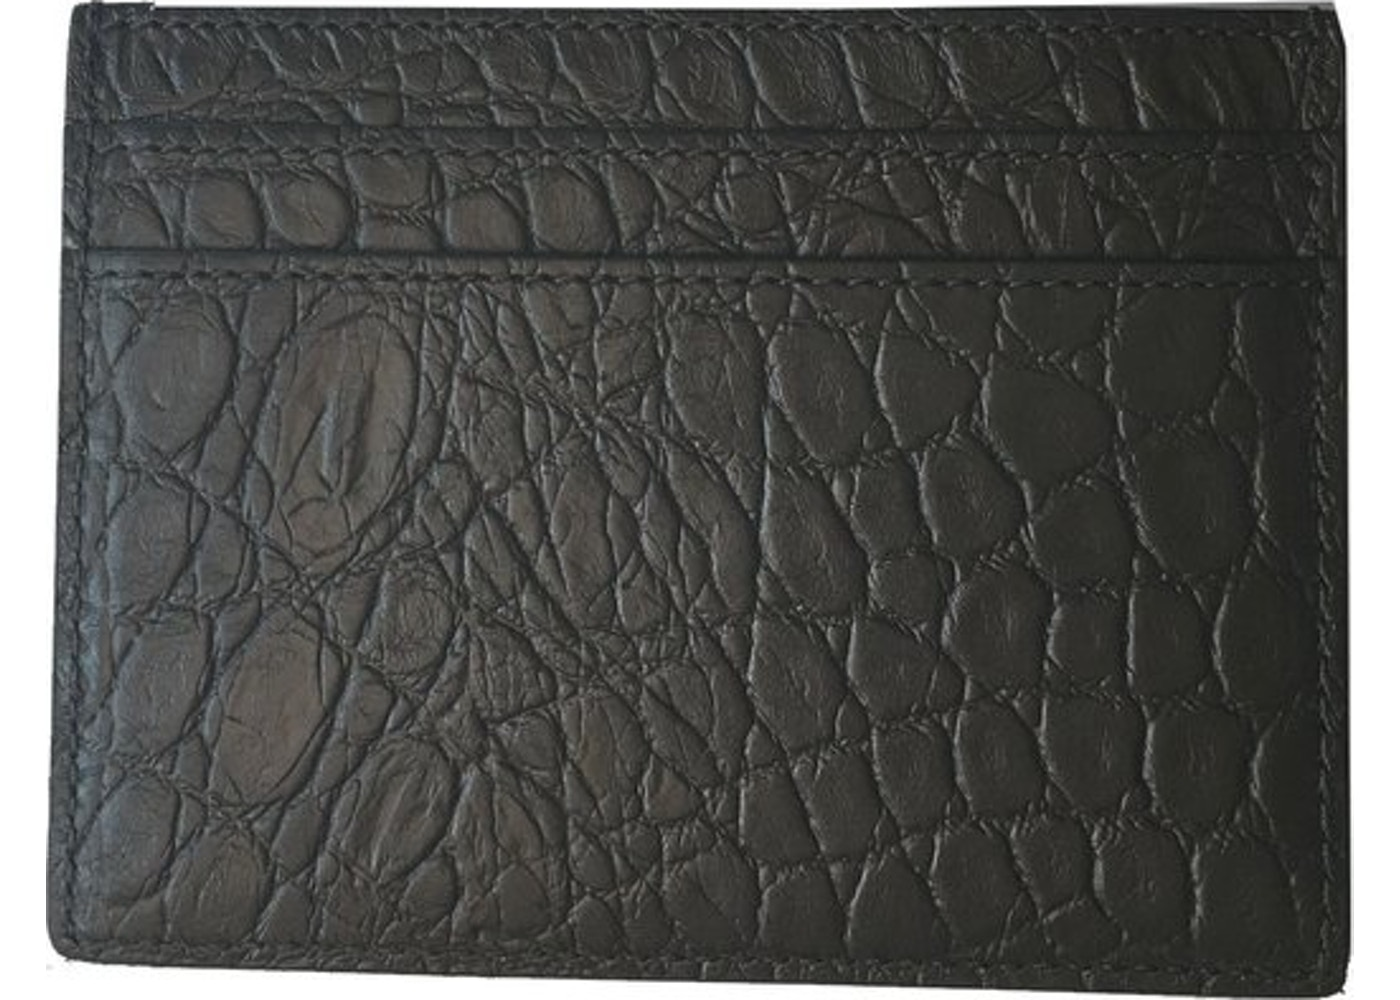 684cf9adc1e6 Saint Laurent Card Holder Crocodile Print Coal